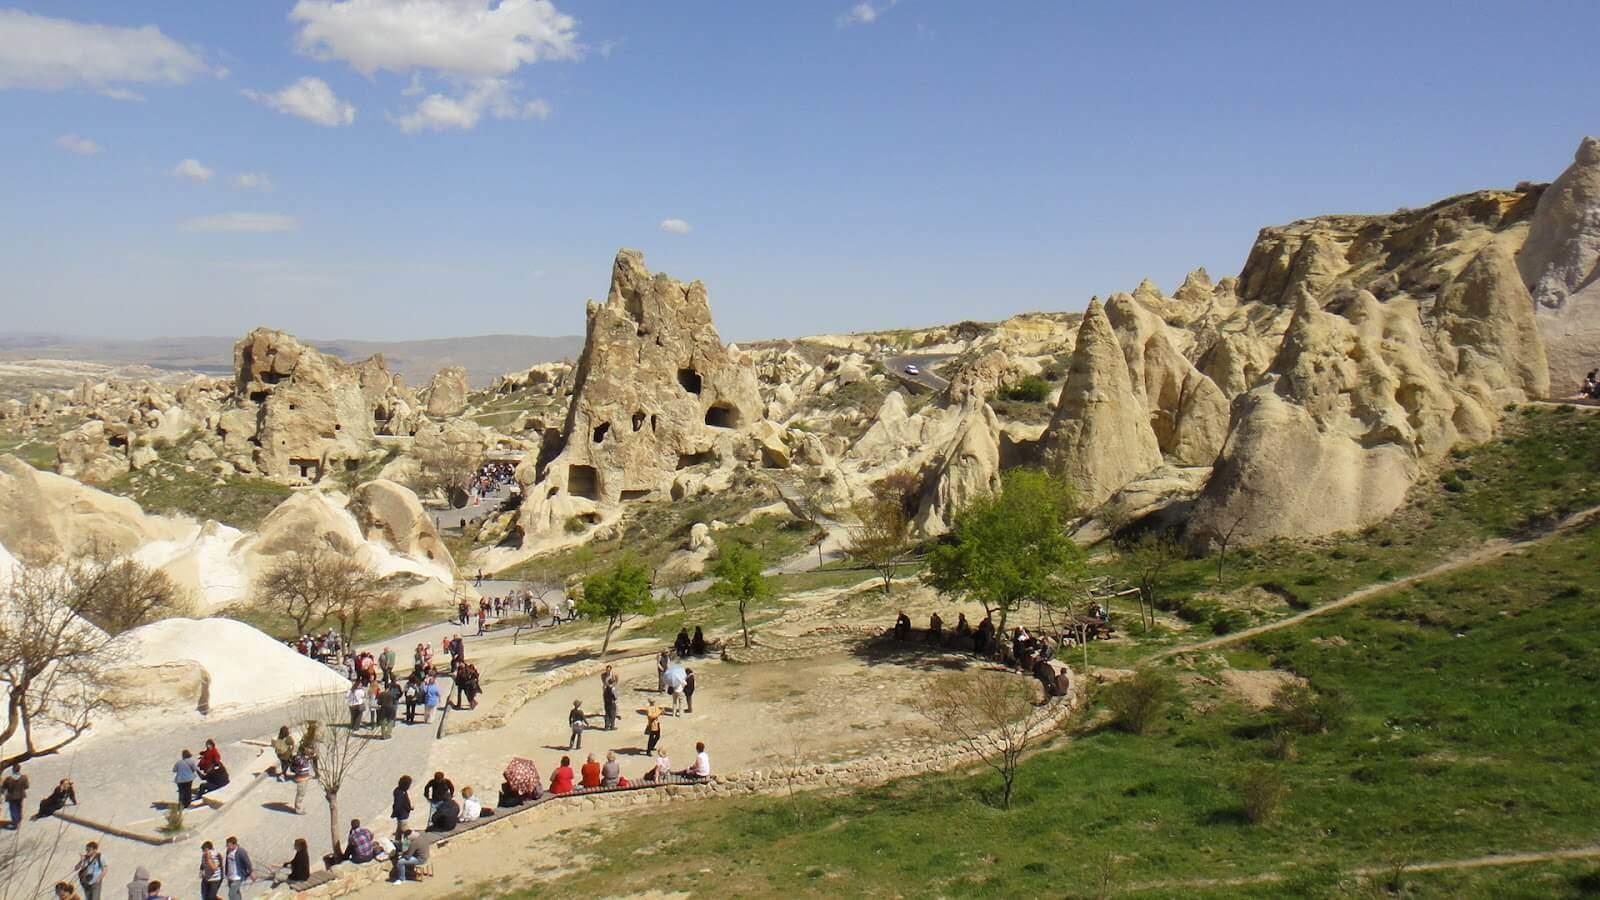 Goreme Open Air Museum / Cappadocia